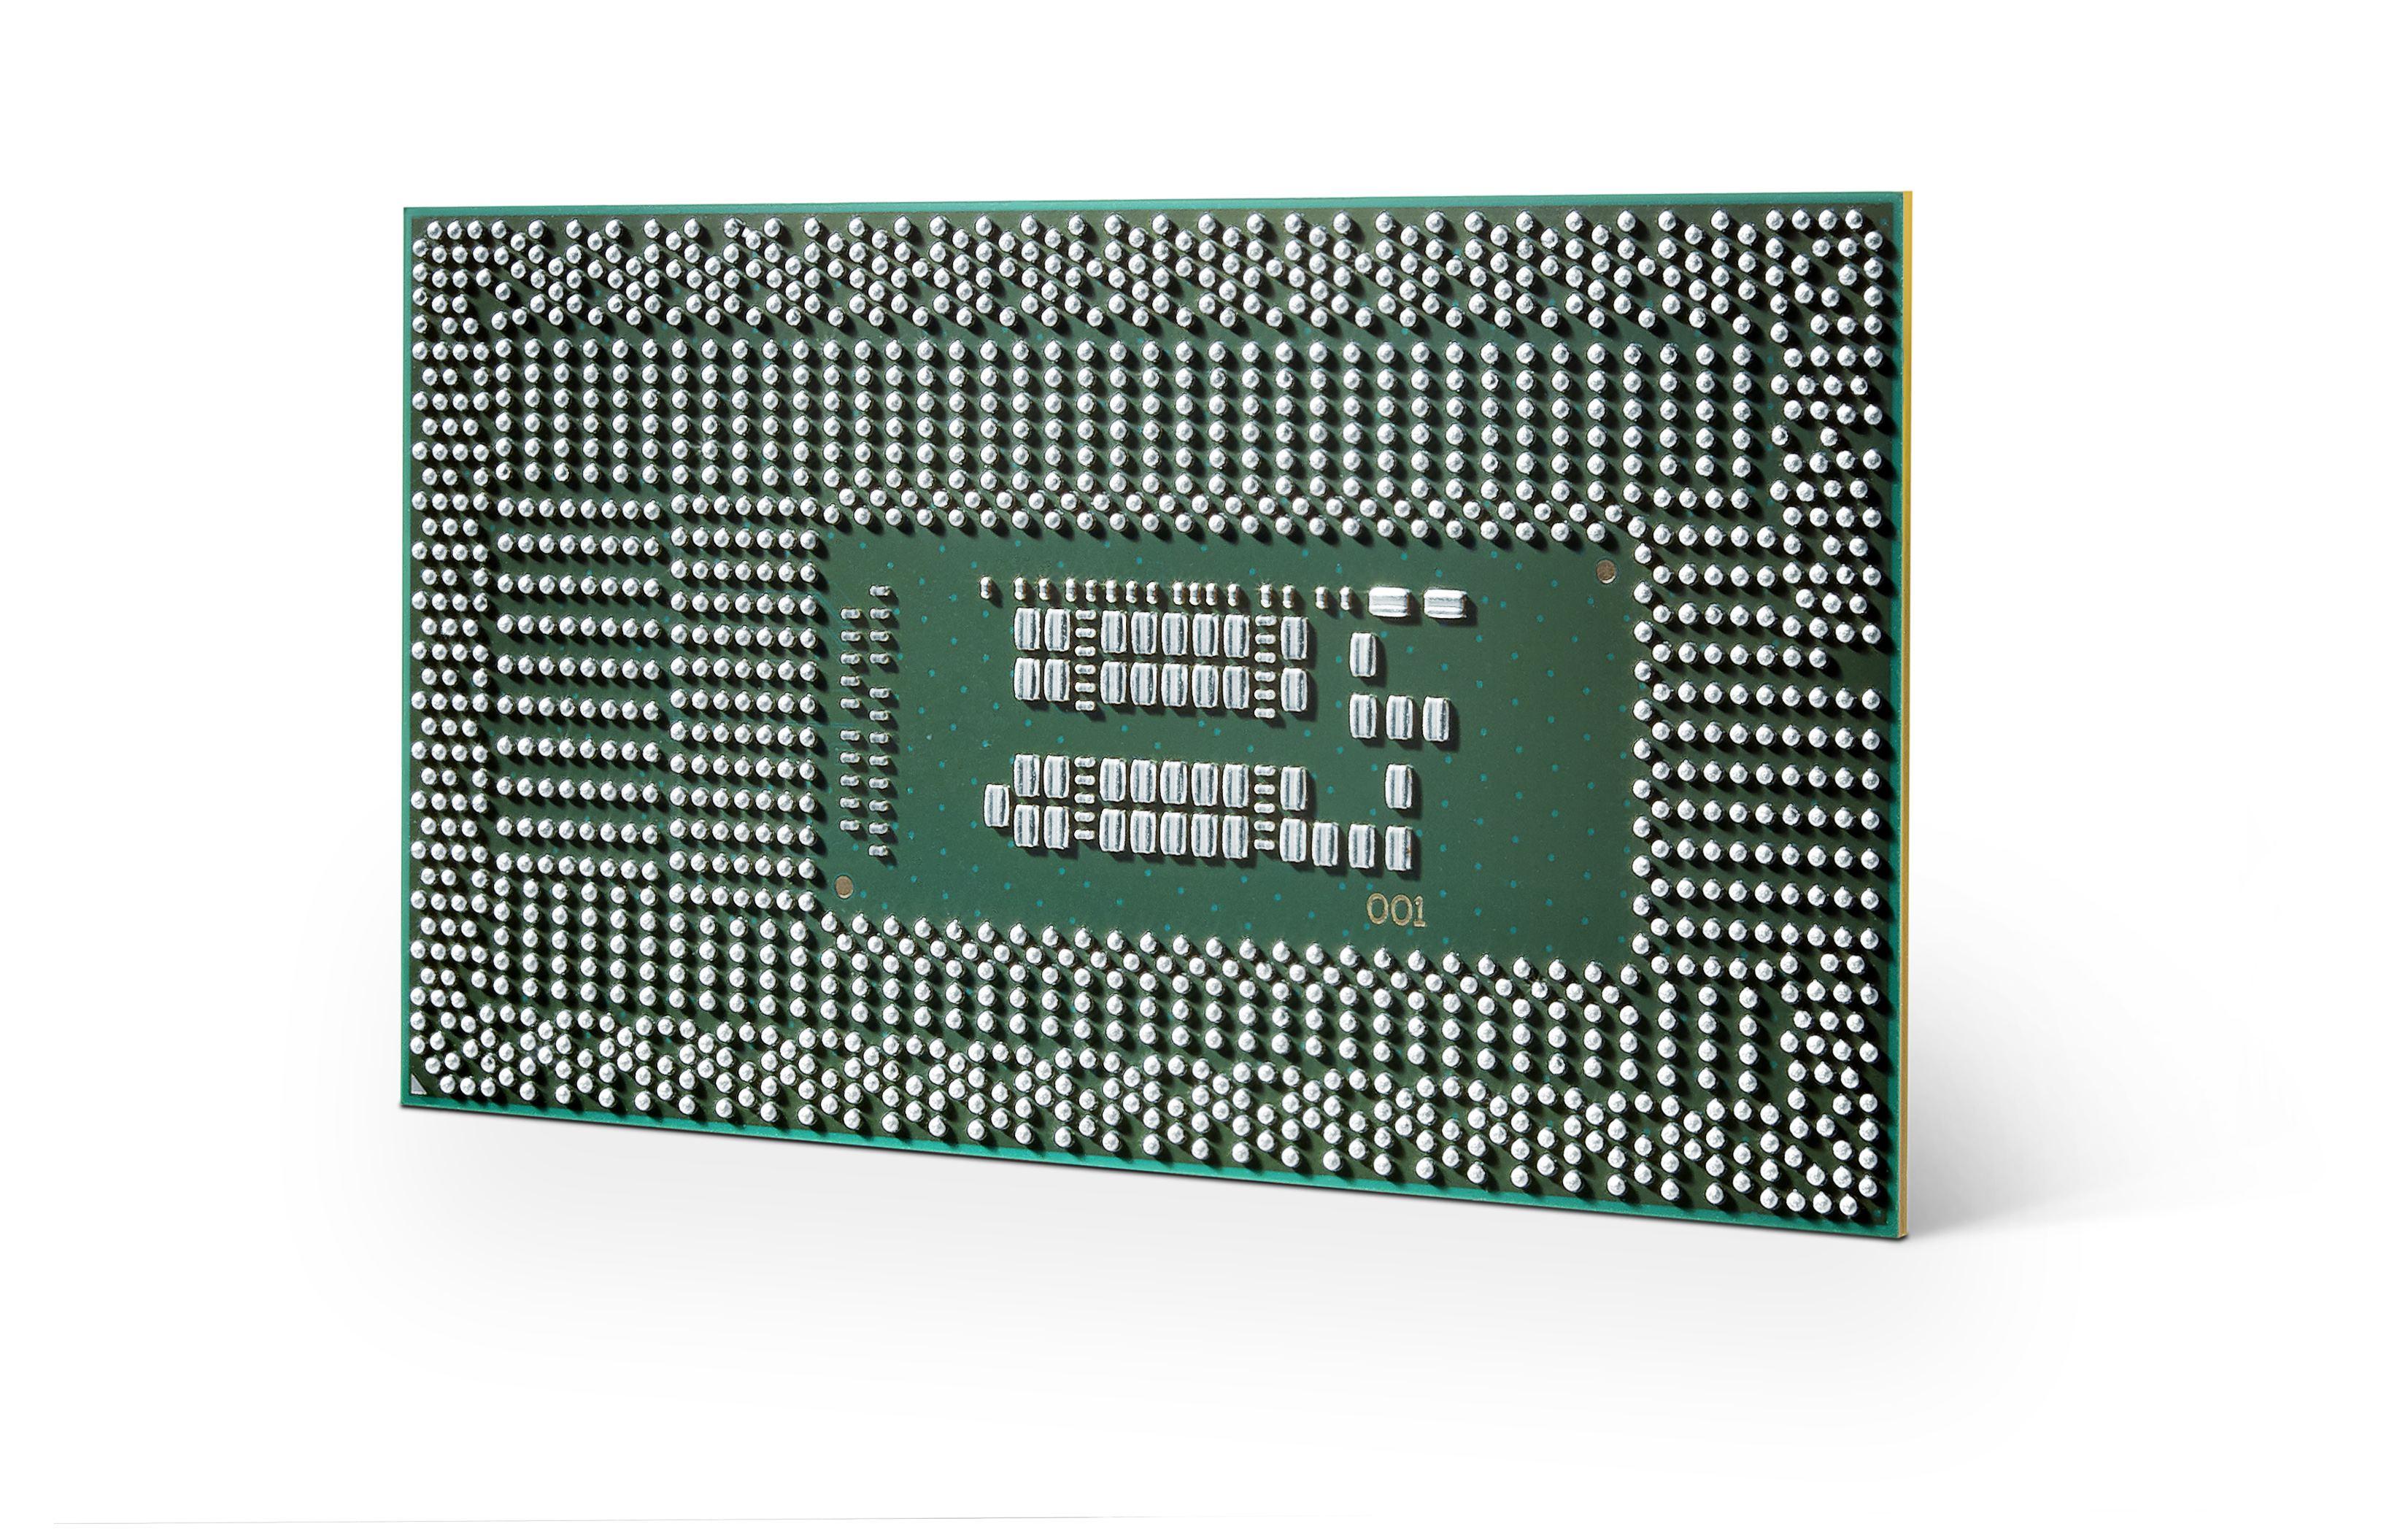 8th Gen Intel Core U-series back